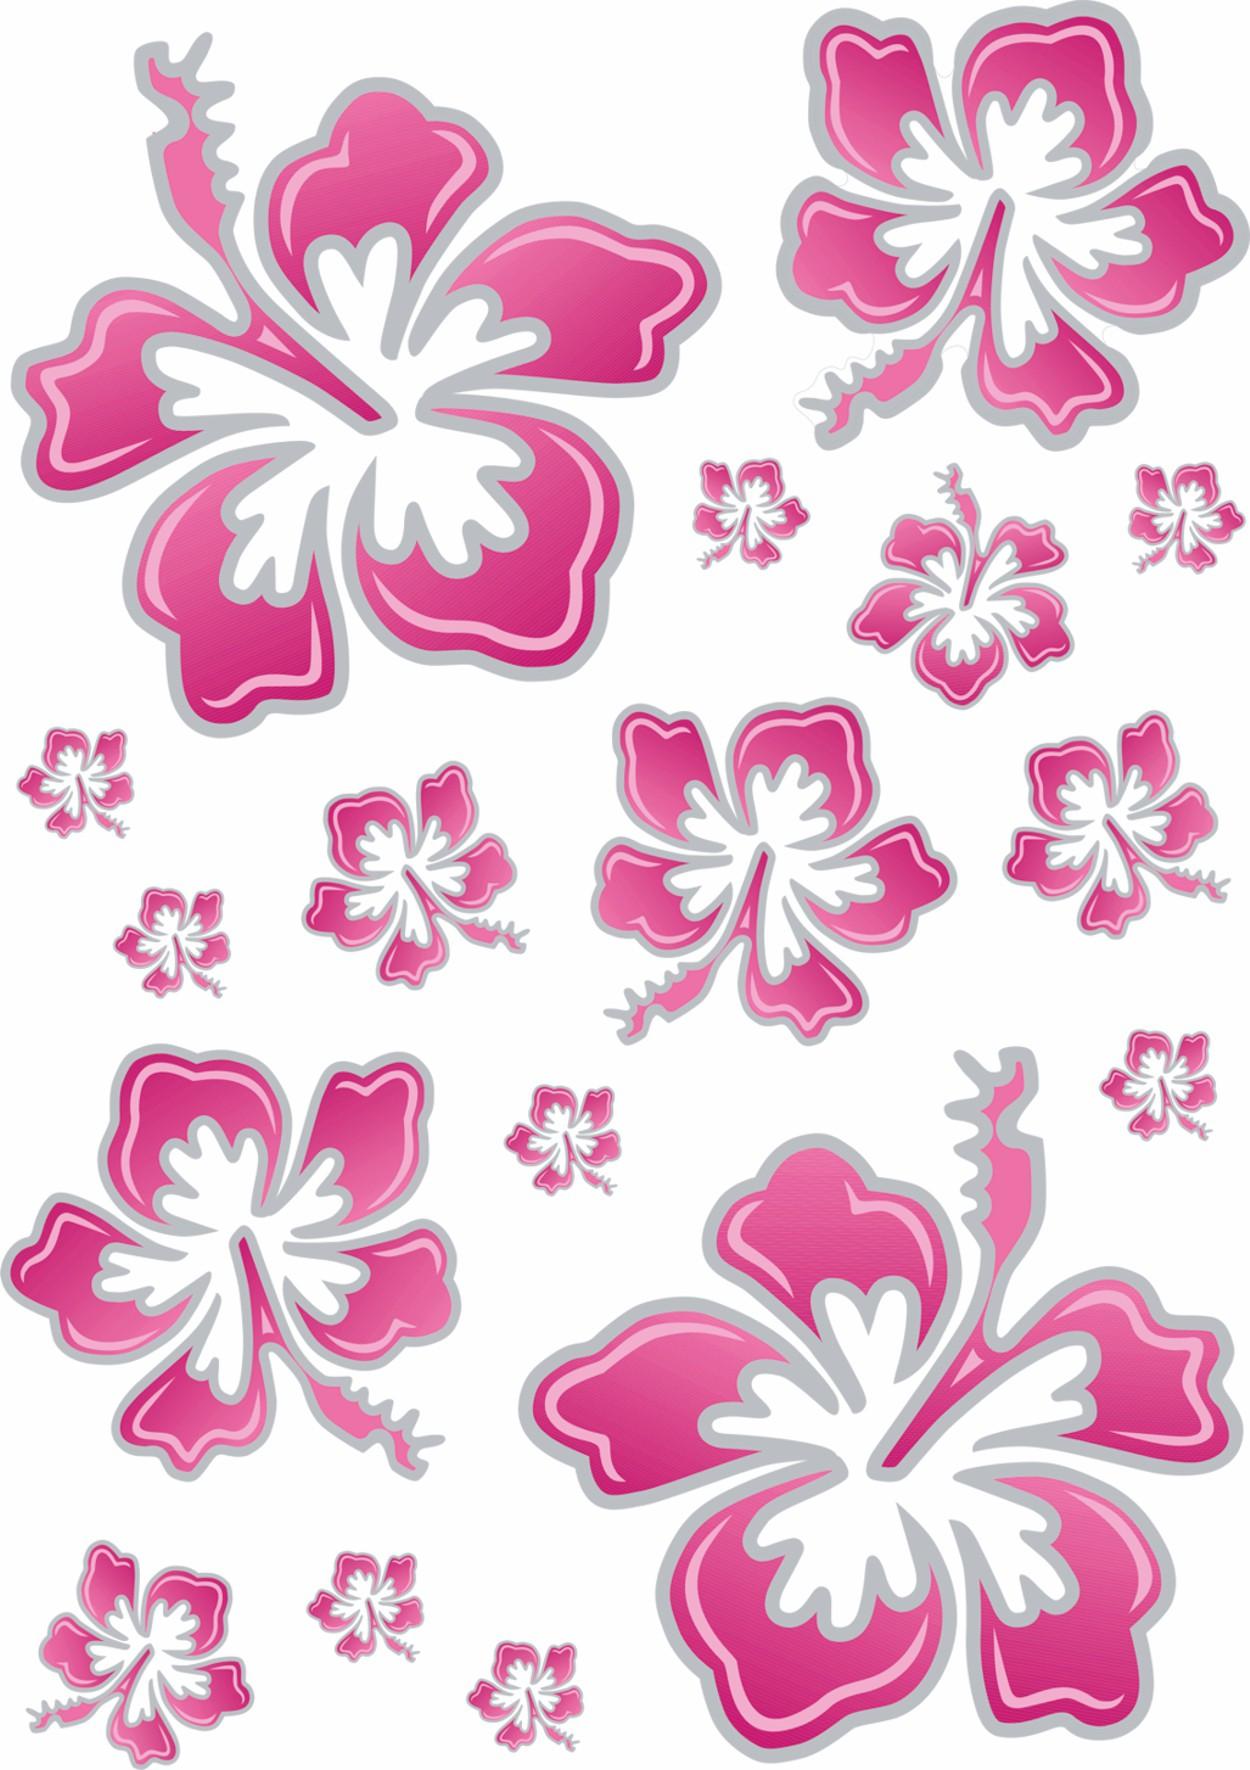 Sticker hibiscus flower set 480 x 310 mm pinksilver car deco sticker hibiscus flower set 480 x 310 mm pinksilver izmirmasajfo